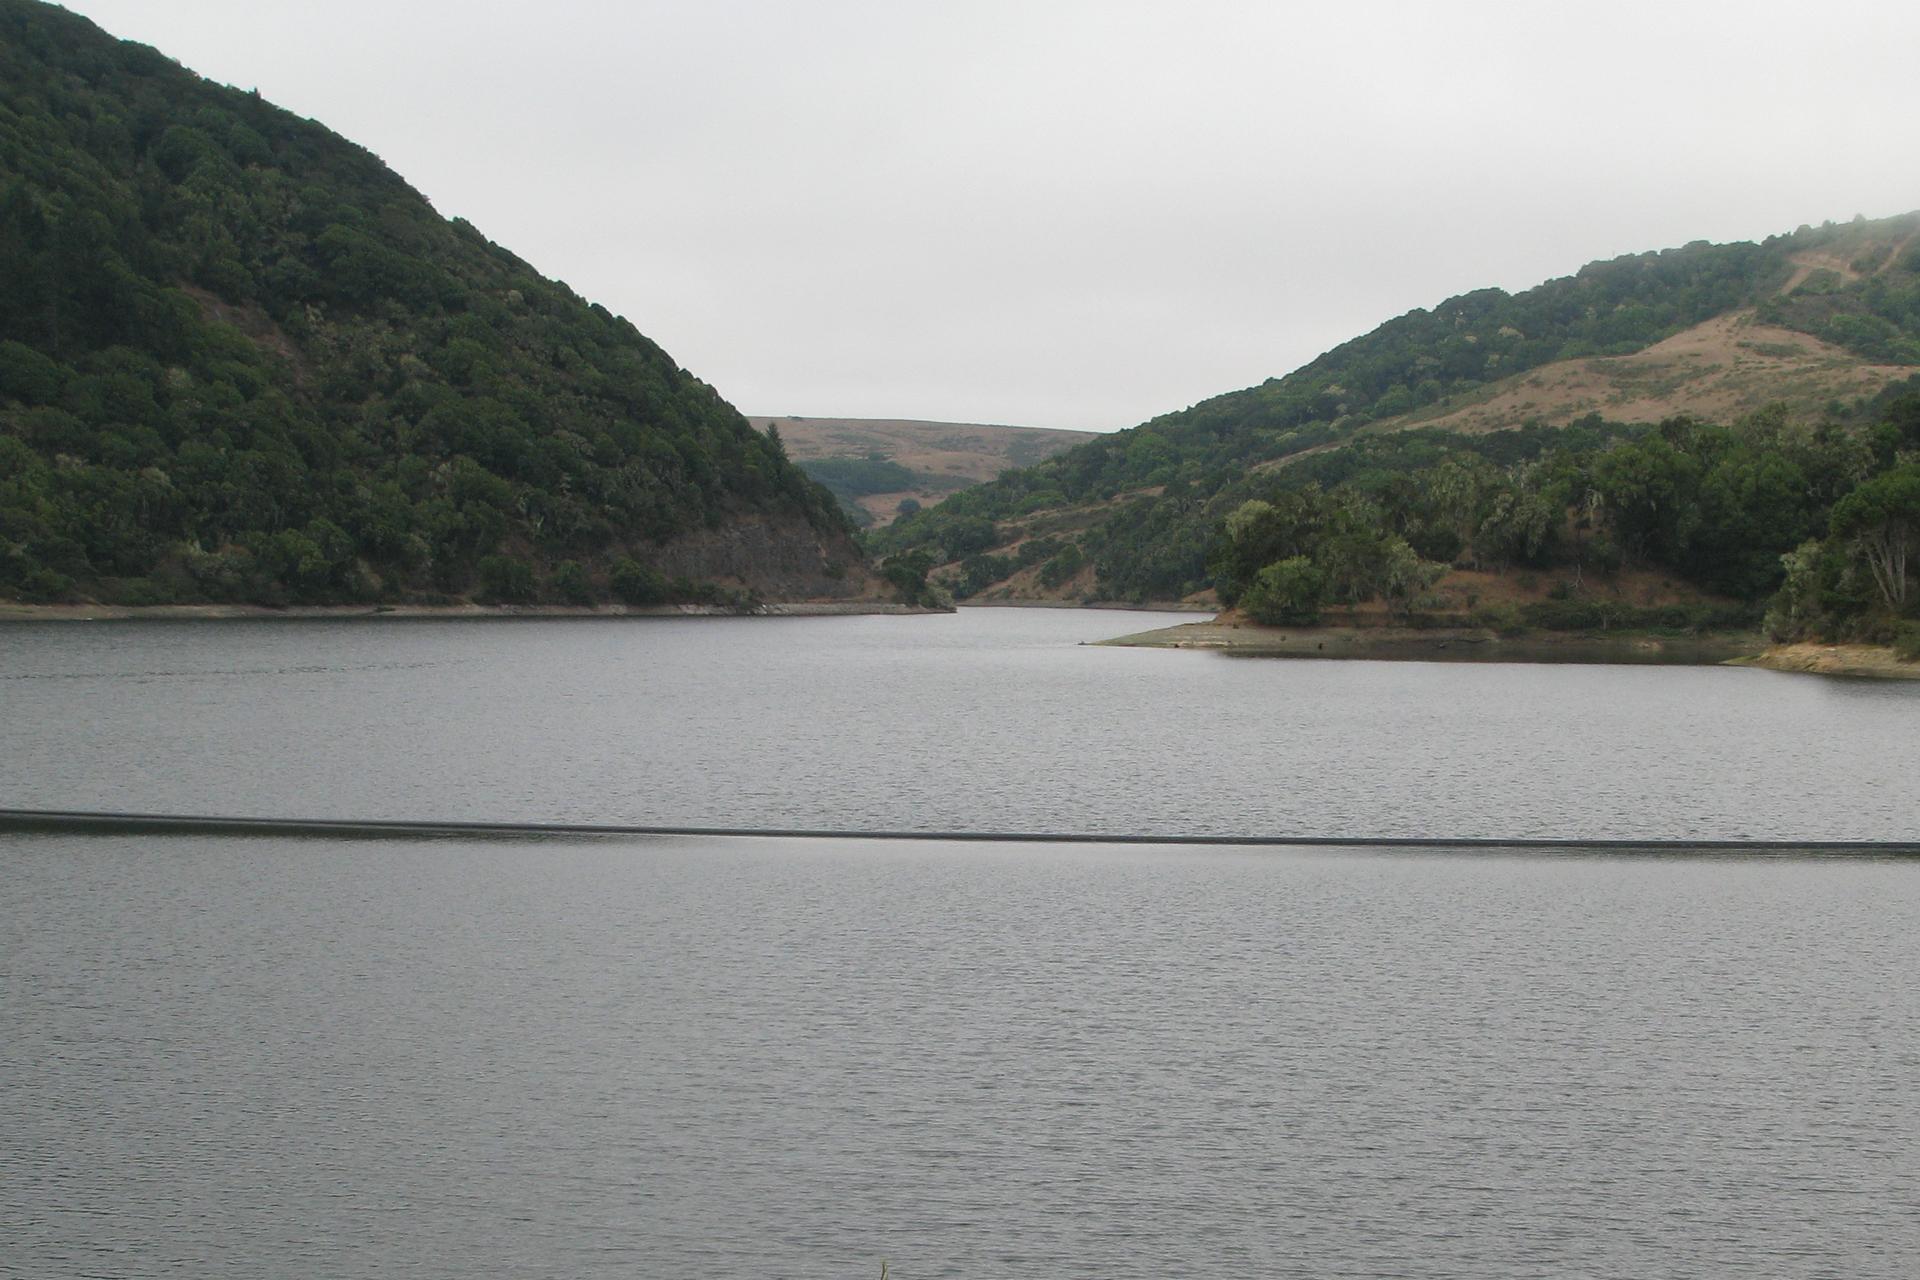 Soulajule Reservoir - Marin County, CA